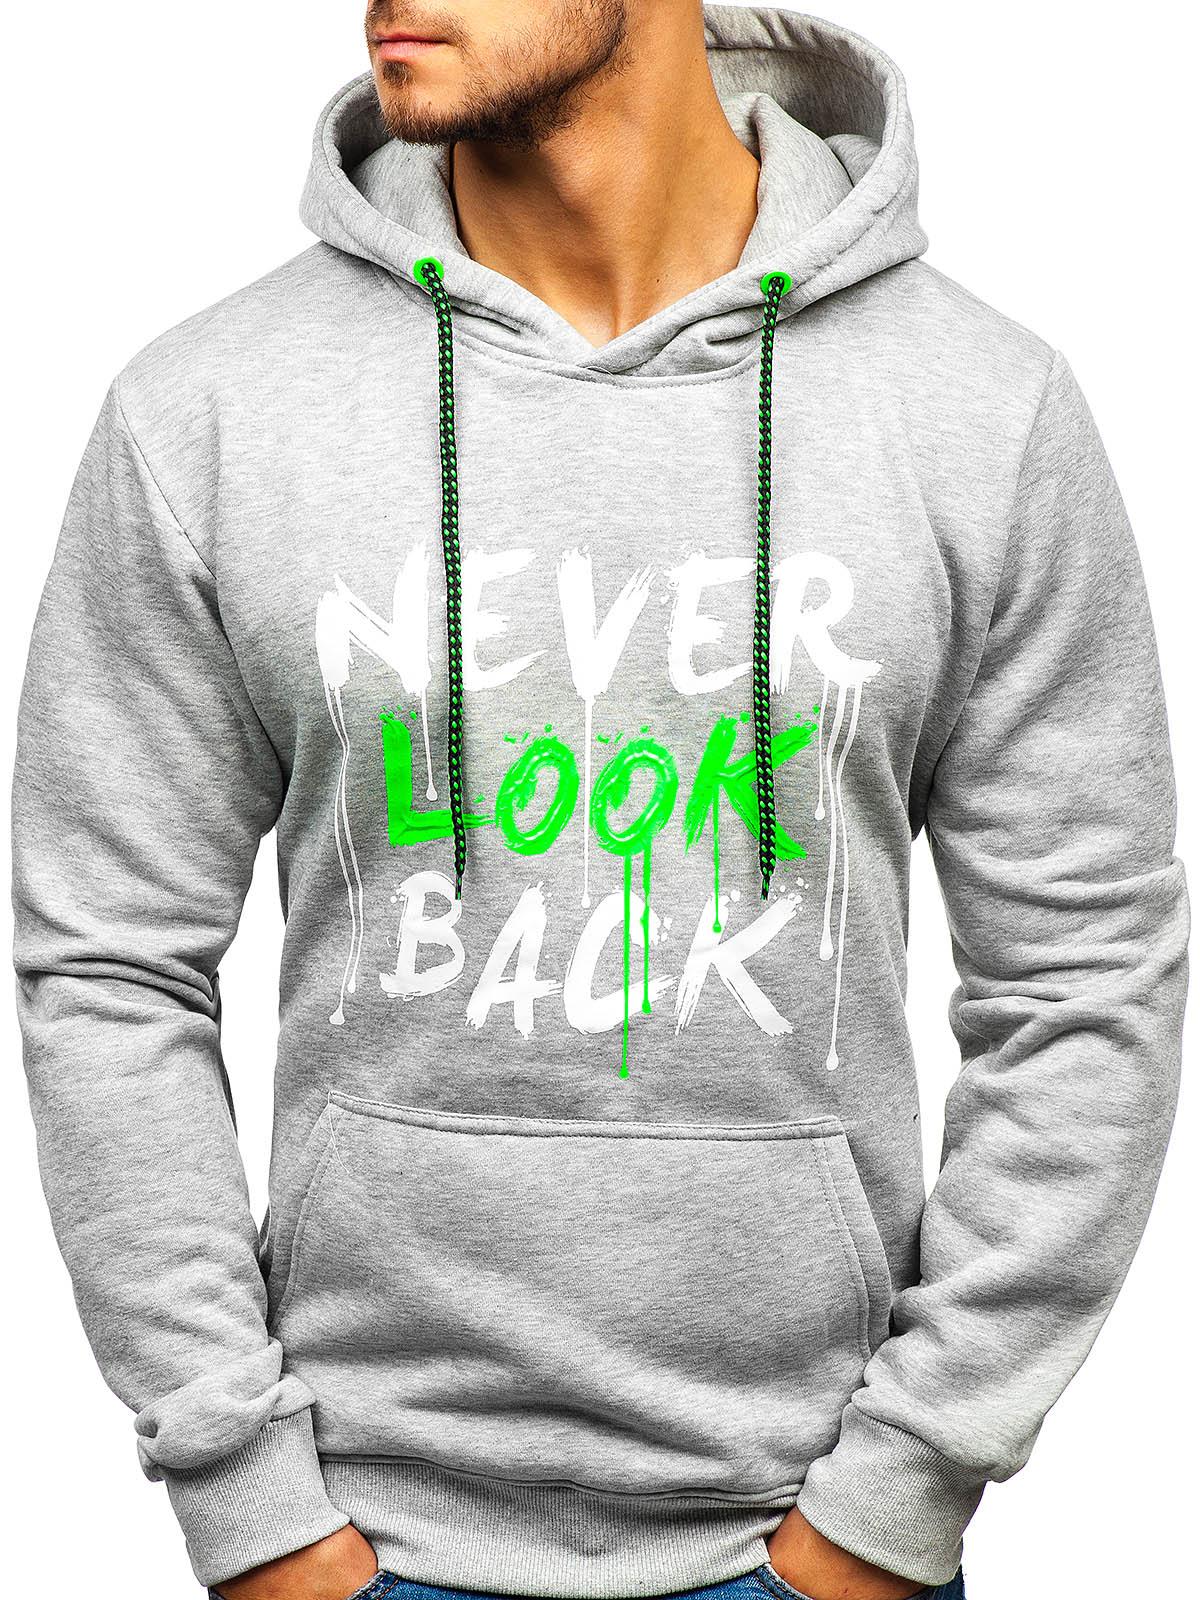 Kapuzenpullover Sweatshirt Pullover Print 3D Hoodie Herren Mix BOLF 1A1 Motiv